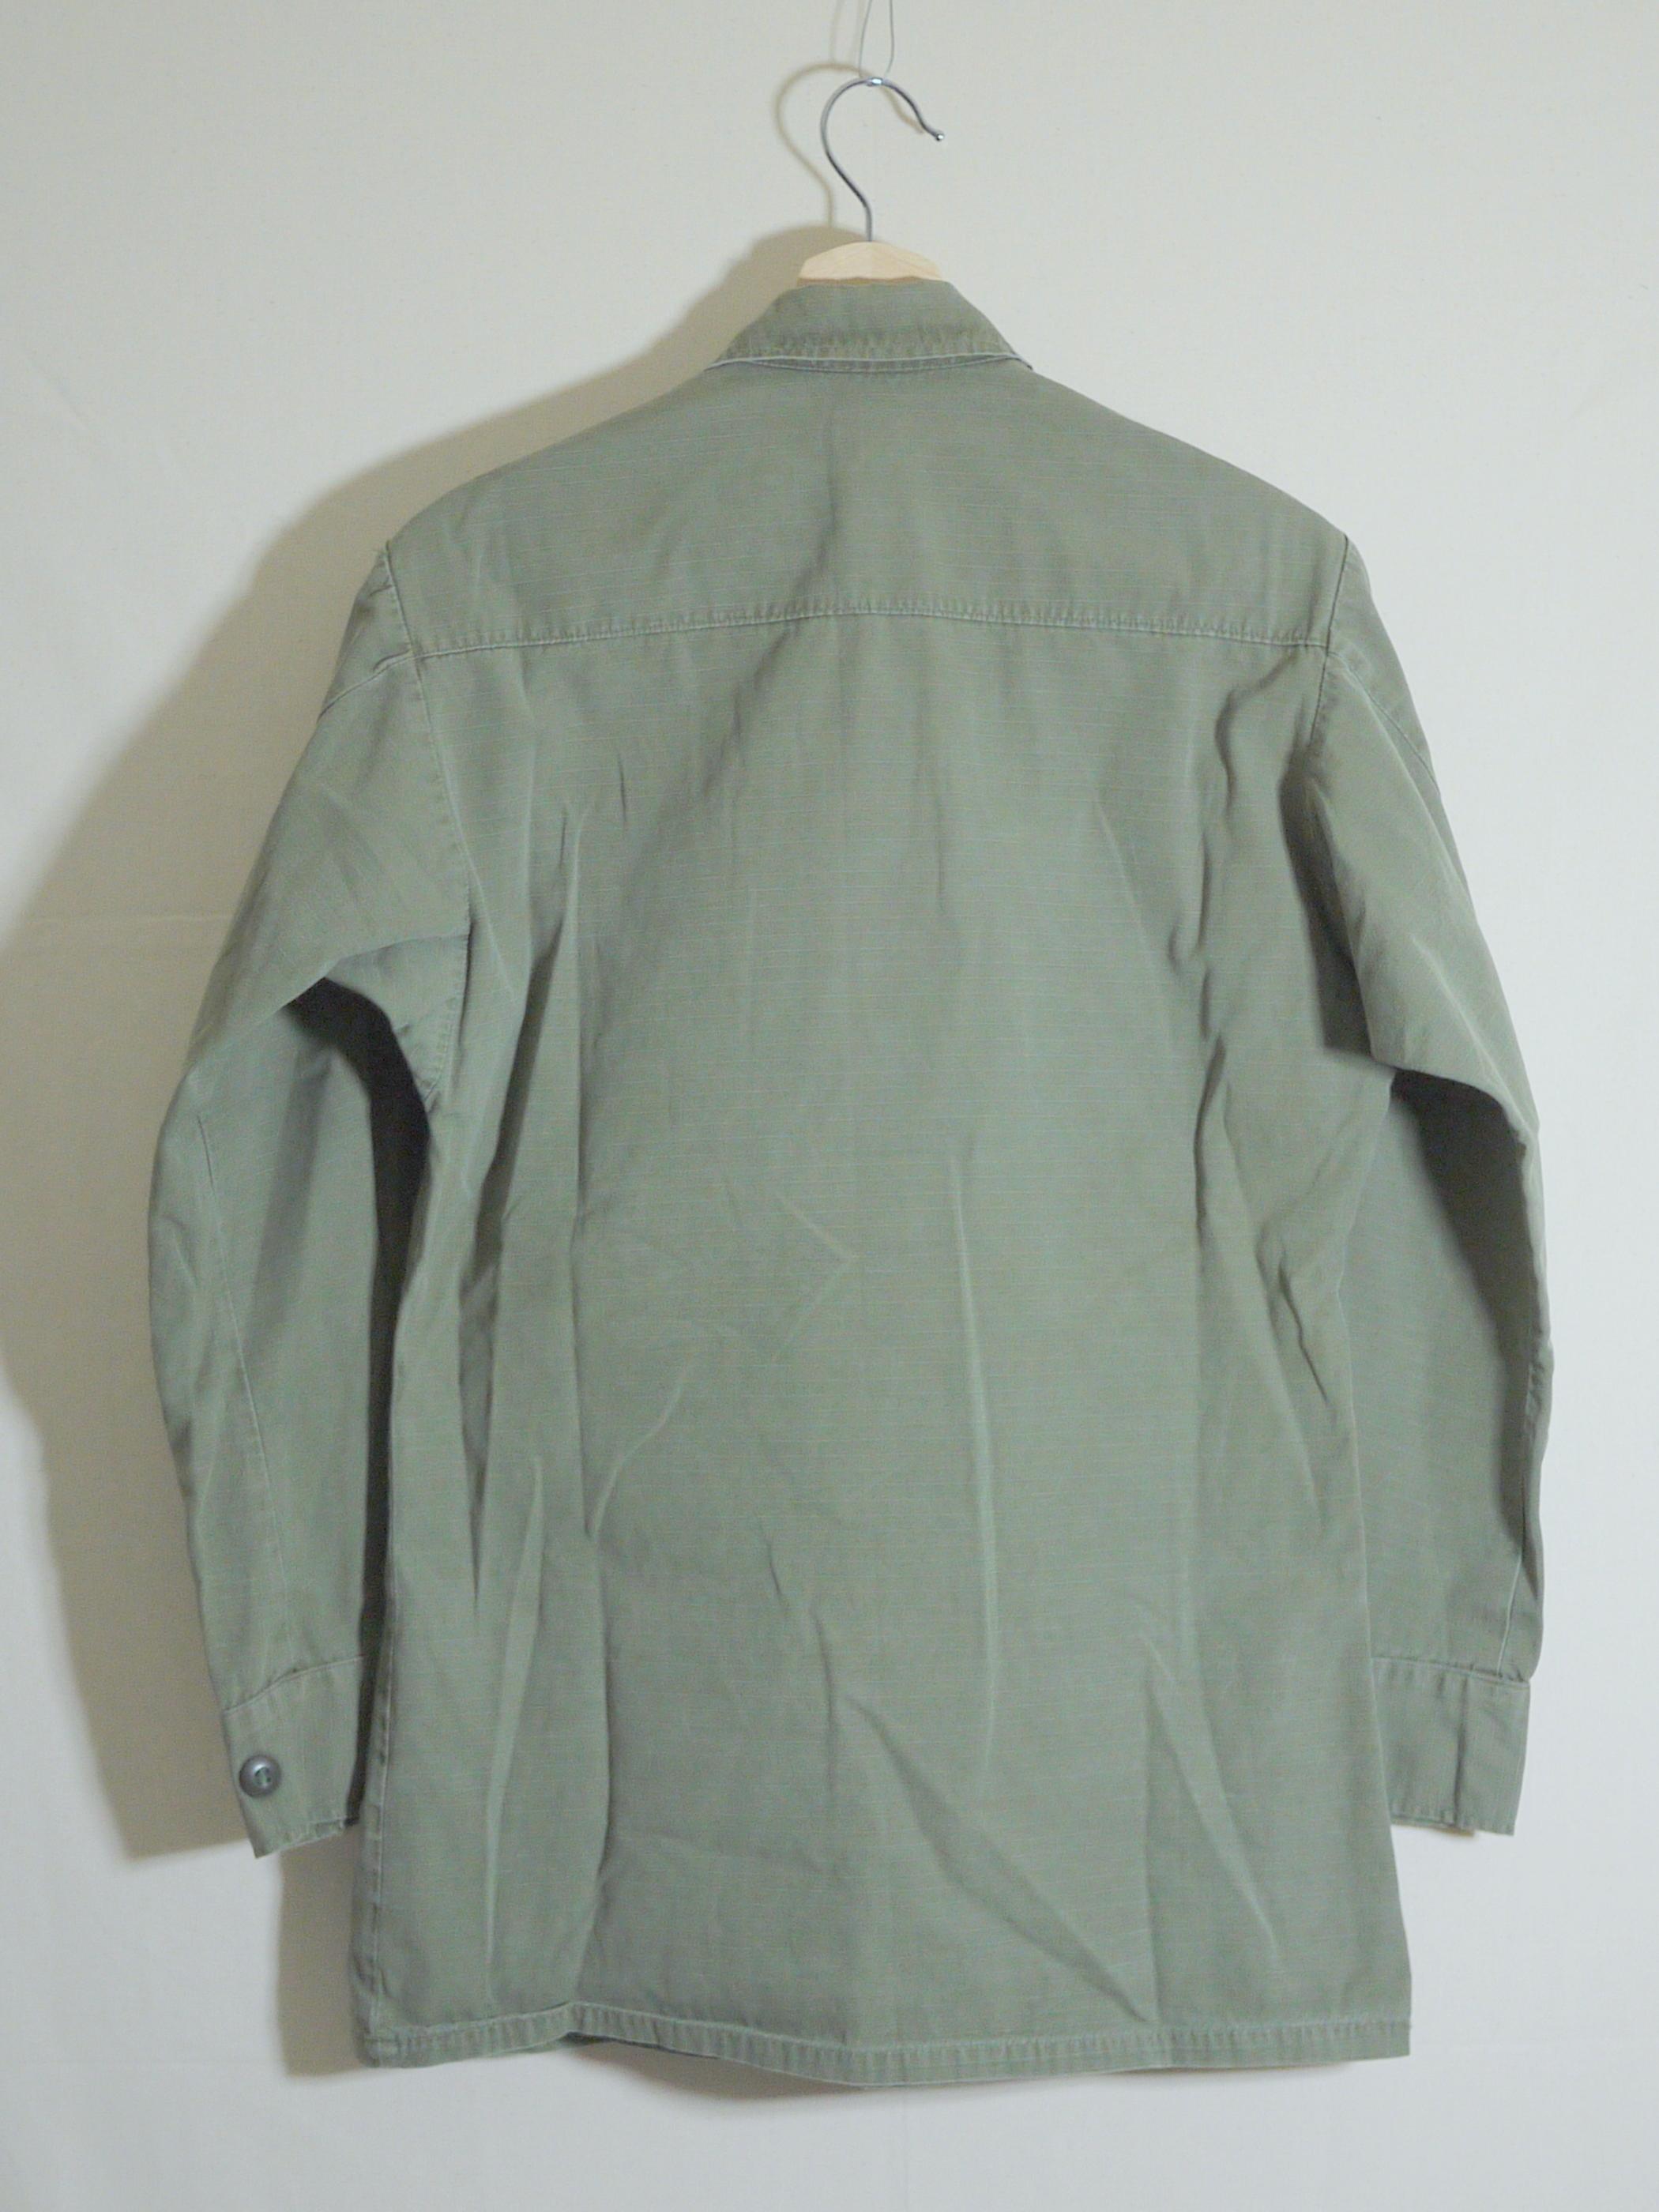 U.S.Military 1970's Fatigue Jacket SizeXS-R #5